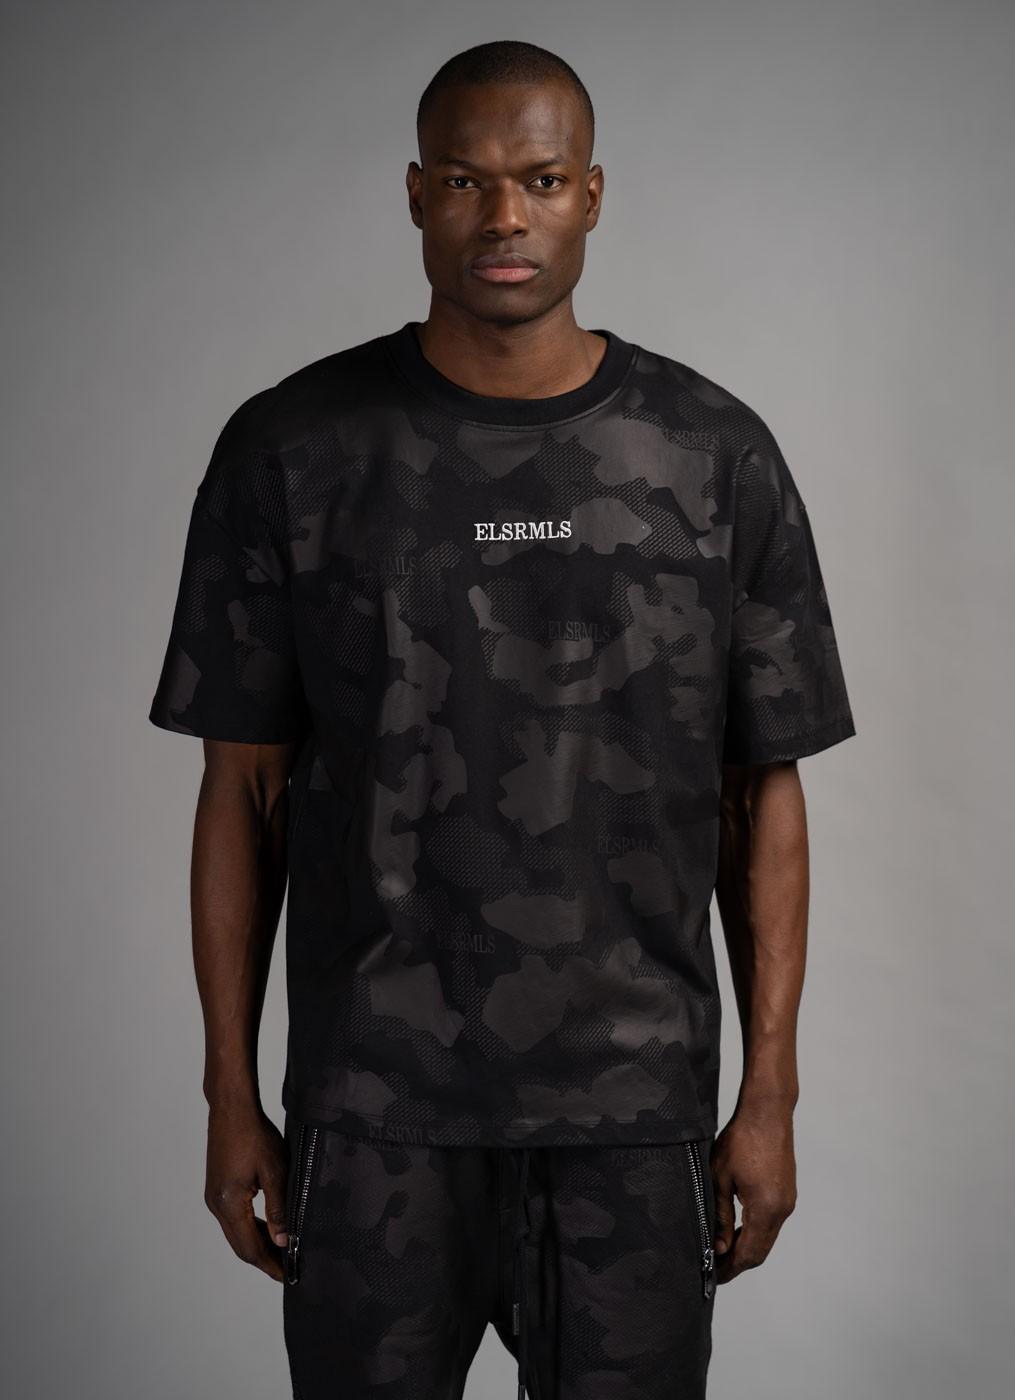 ER Raphy camou - t-shirt